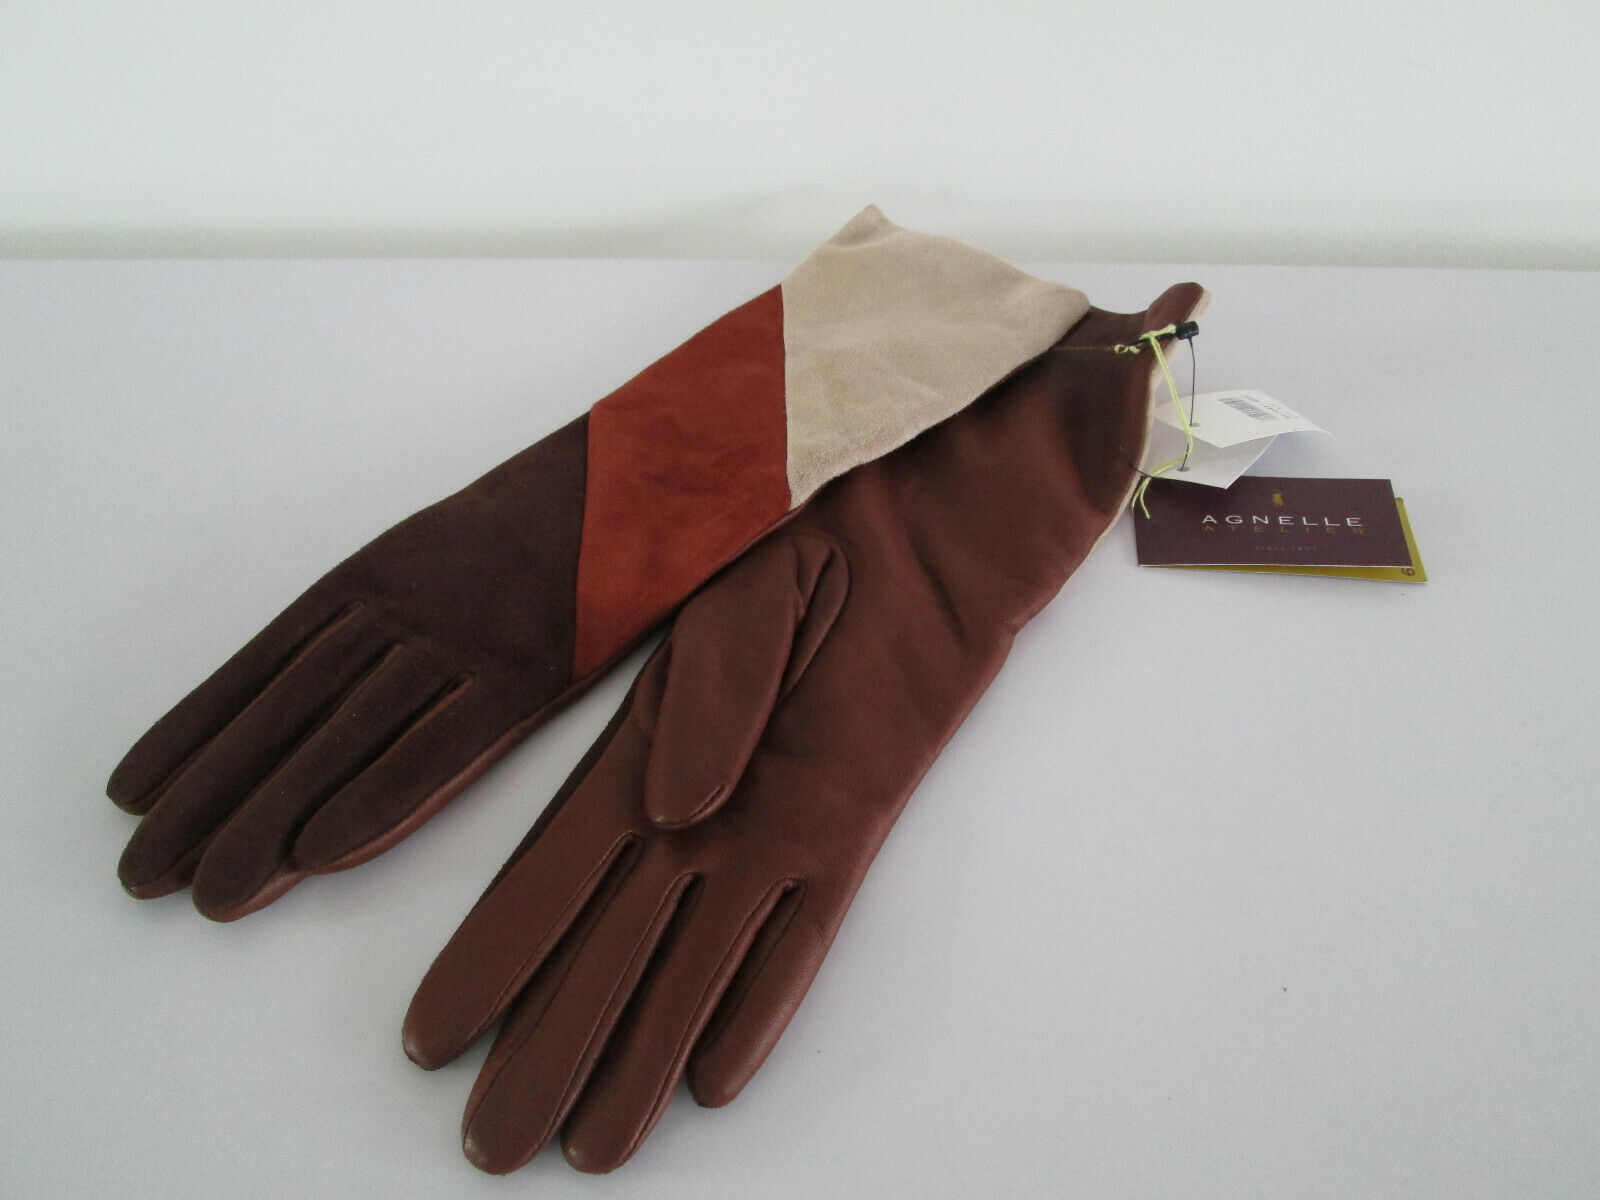 Agnelle para mujer Guantes TNM TAMAÑO 6.5 marrón a rayas de cordero piel de cabra de Cachemira Forrado